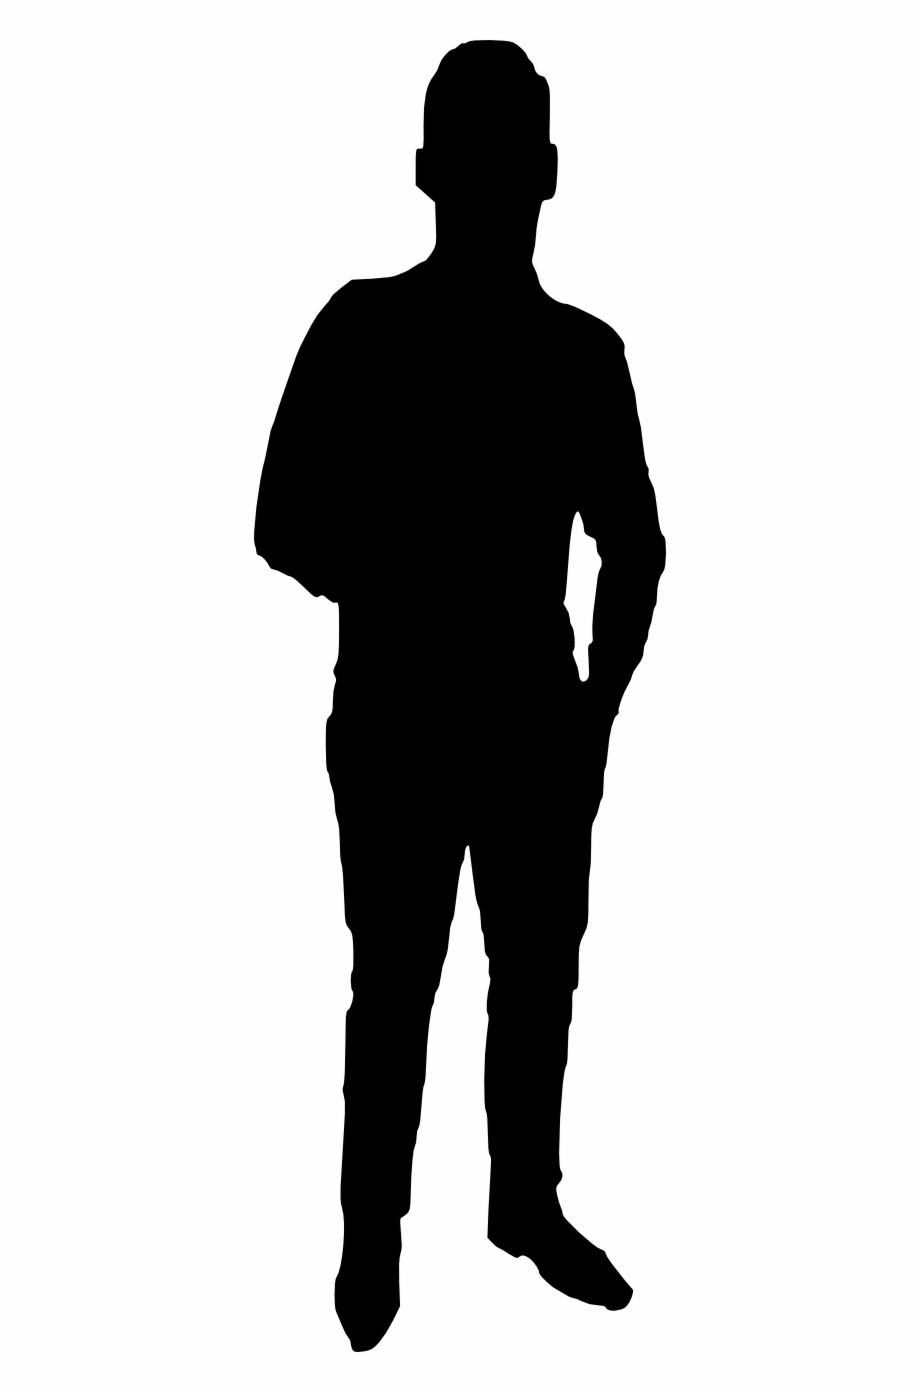 20 Man Silhouette.